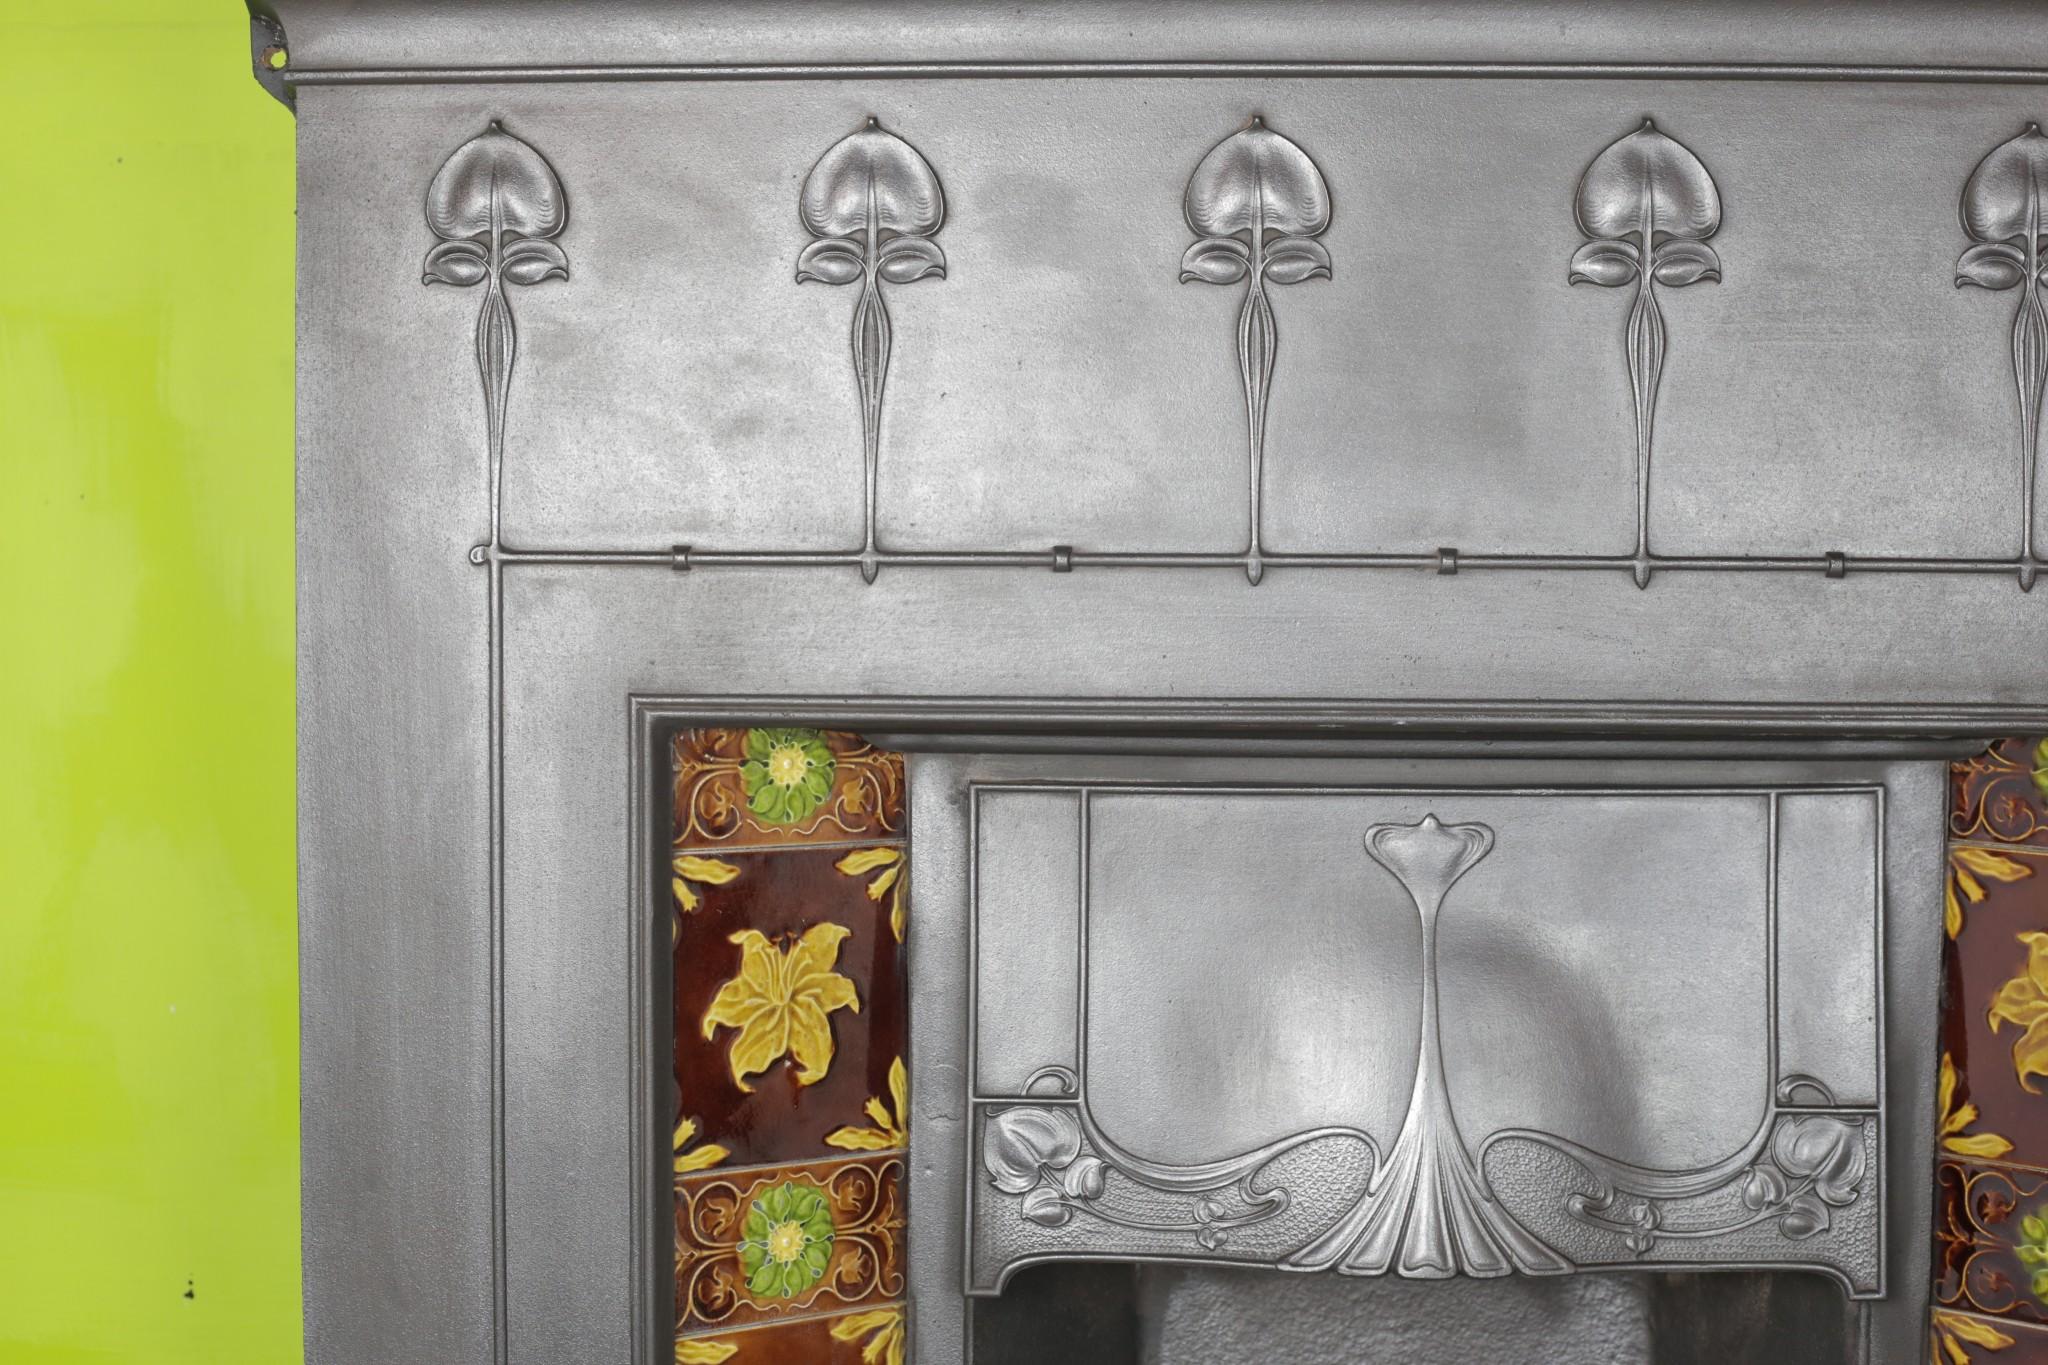 Edwardian Art Nouveau Tile Combination Fireplace Restoration